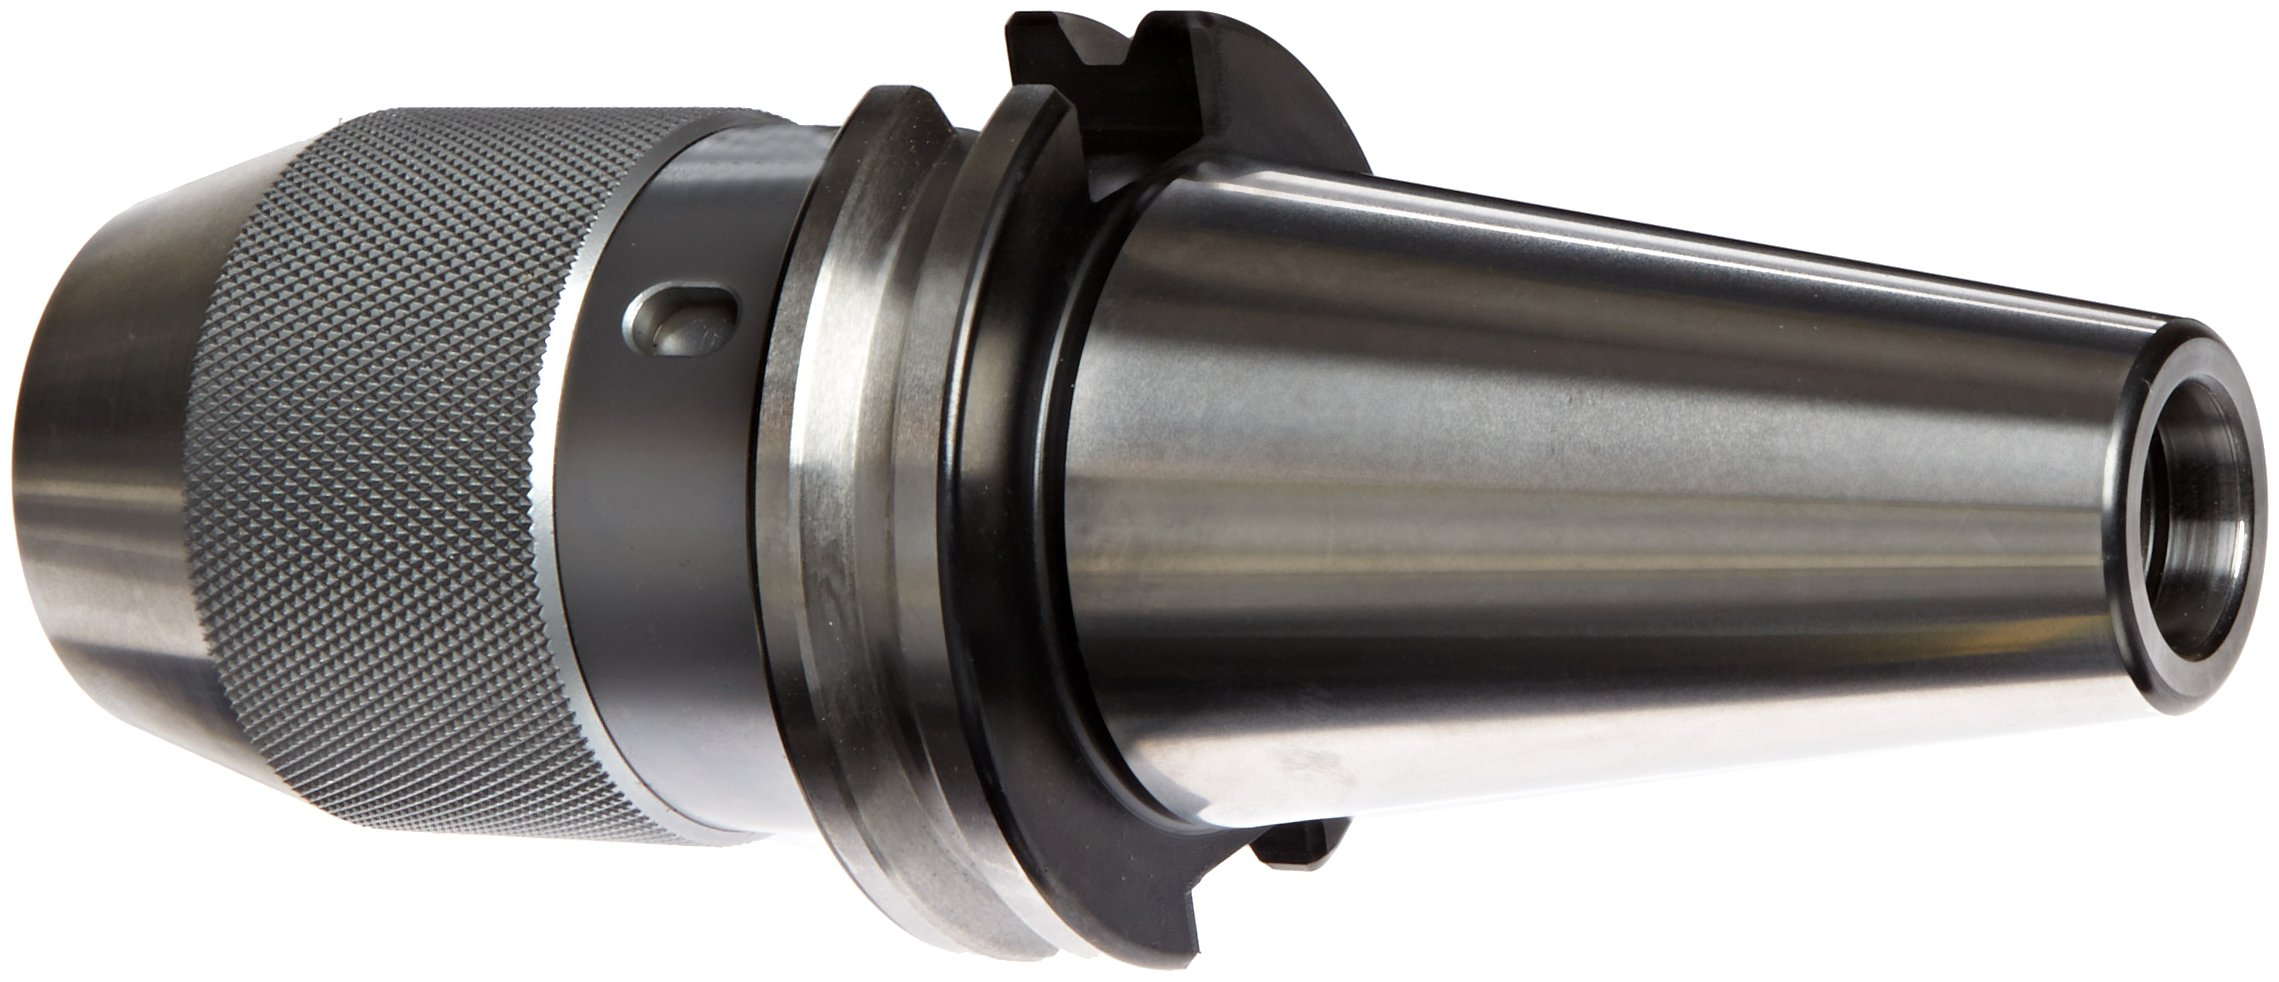 Dorian Tool CAT40 Shank Integral Keyless Drill Chuck Holder, 3.50'' Projection, 2'' Nose Diameter, 1/32'' - 1/2'' Capacity